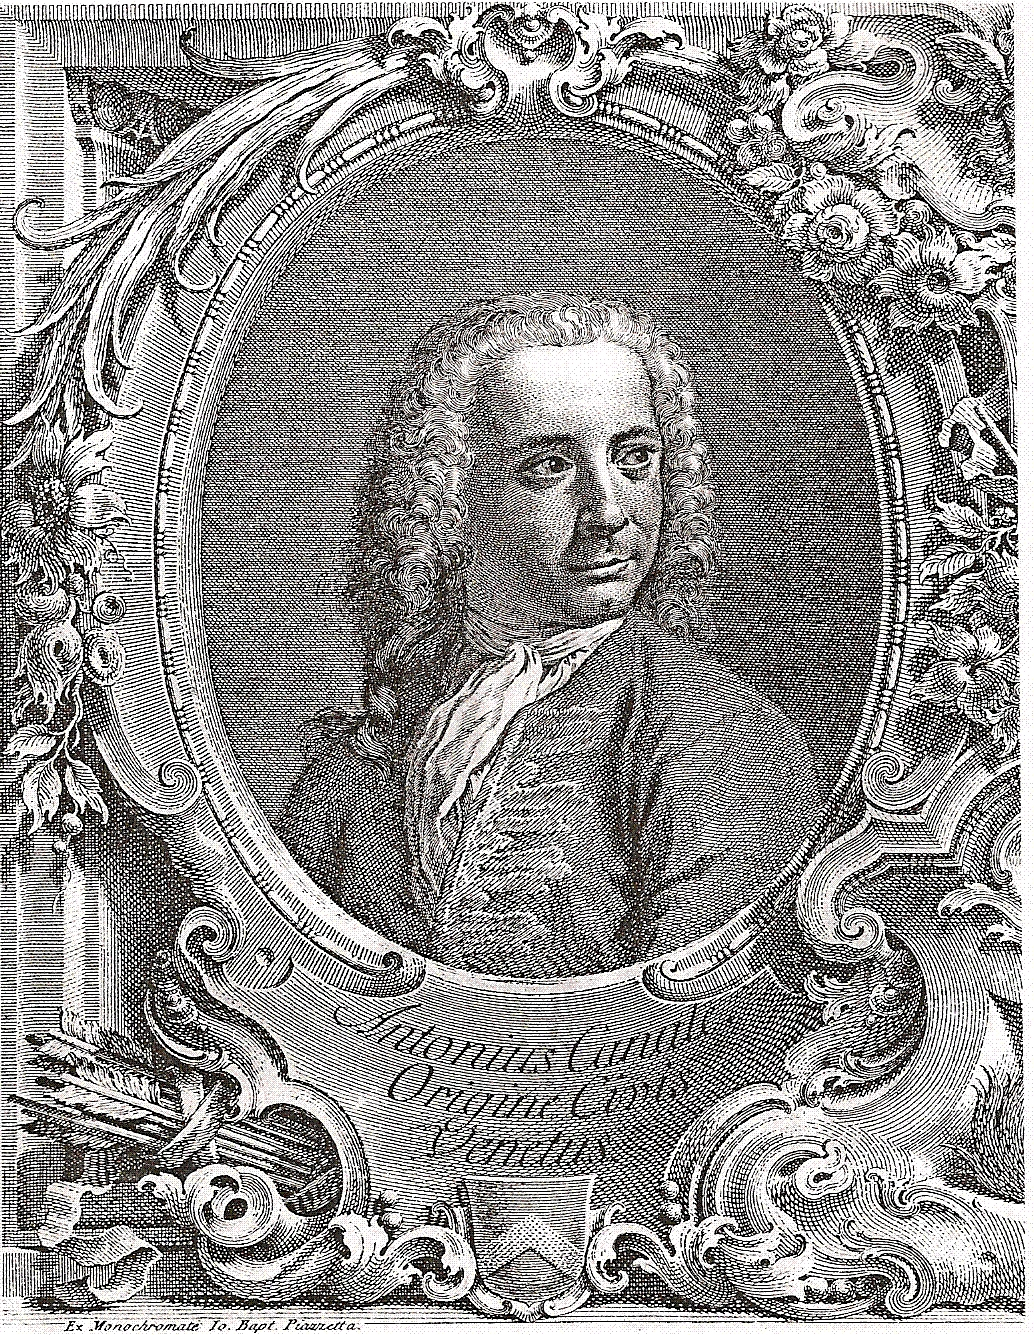 http://upload.wikimedia.org/wikipedia/commons/f/f6/Giovanni_Antonio_Canal.jpg